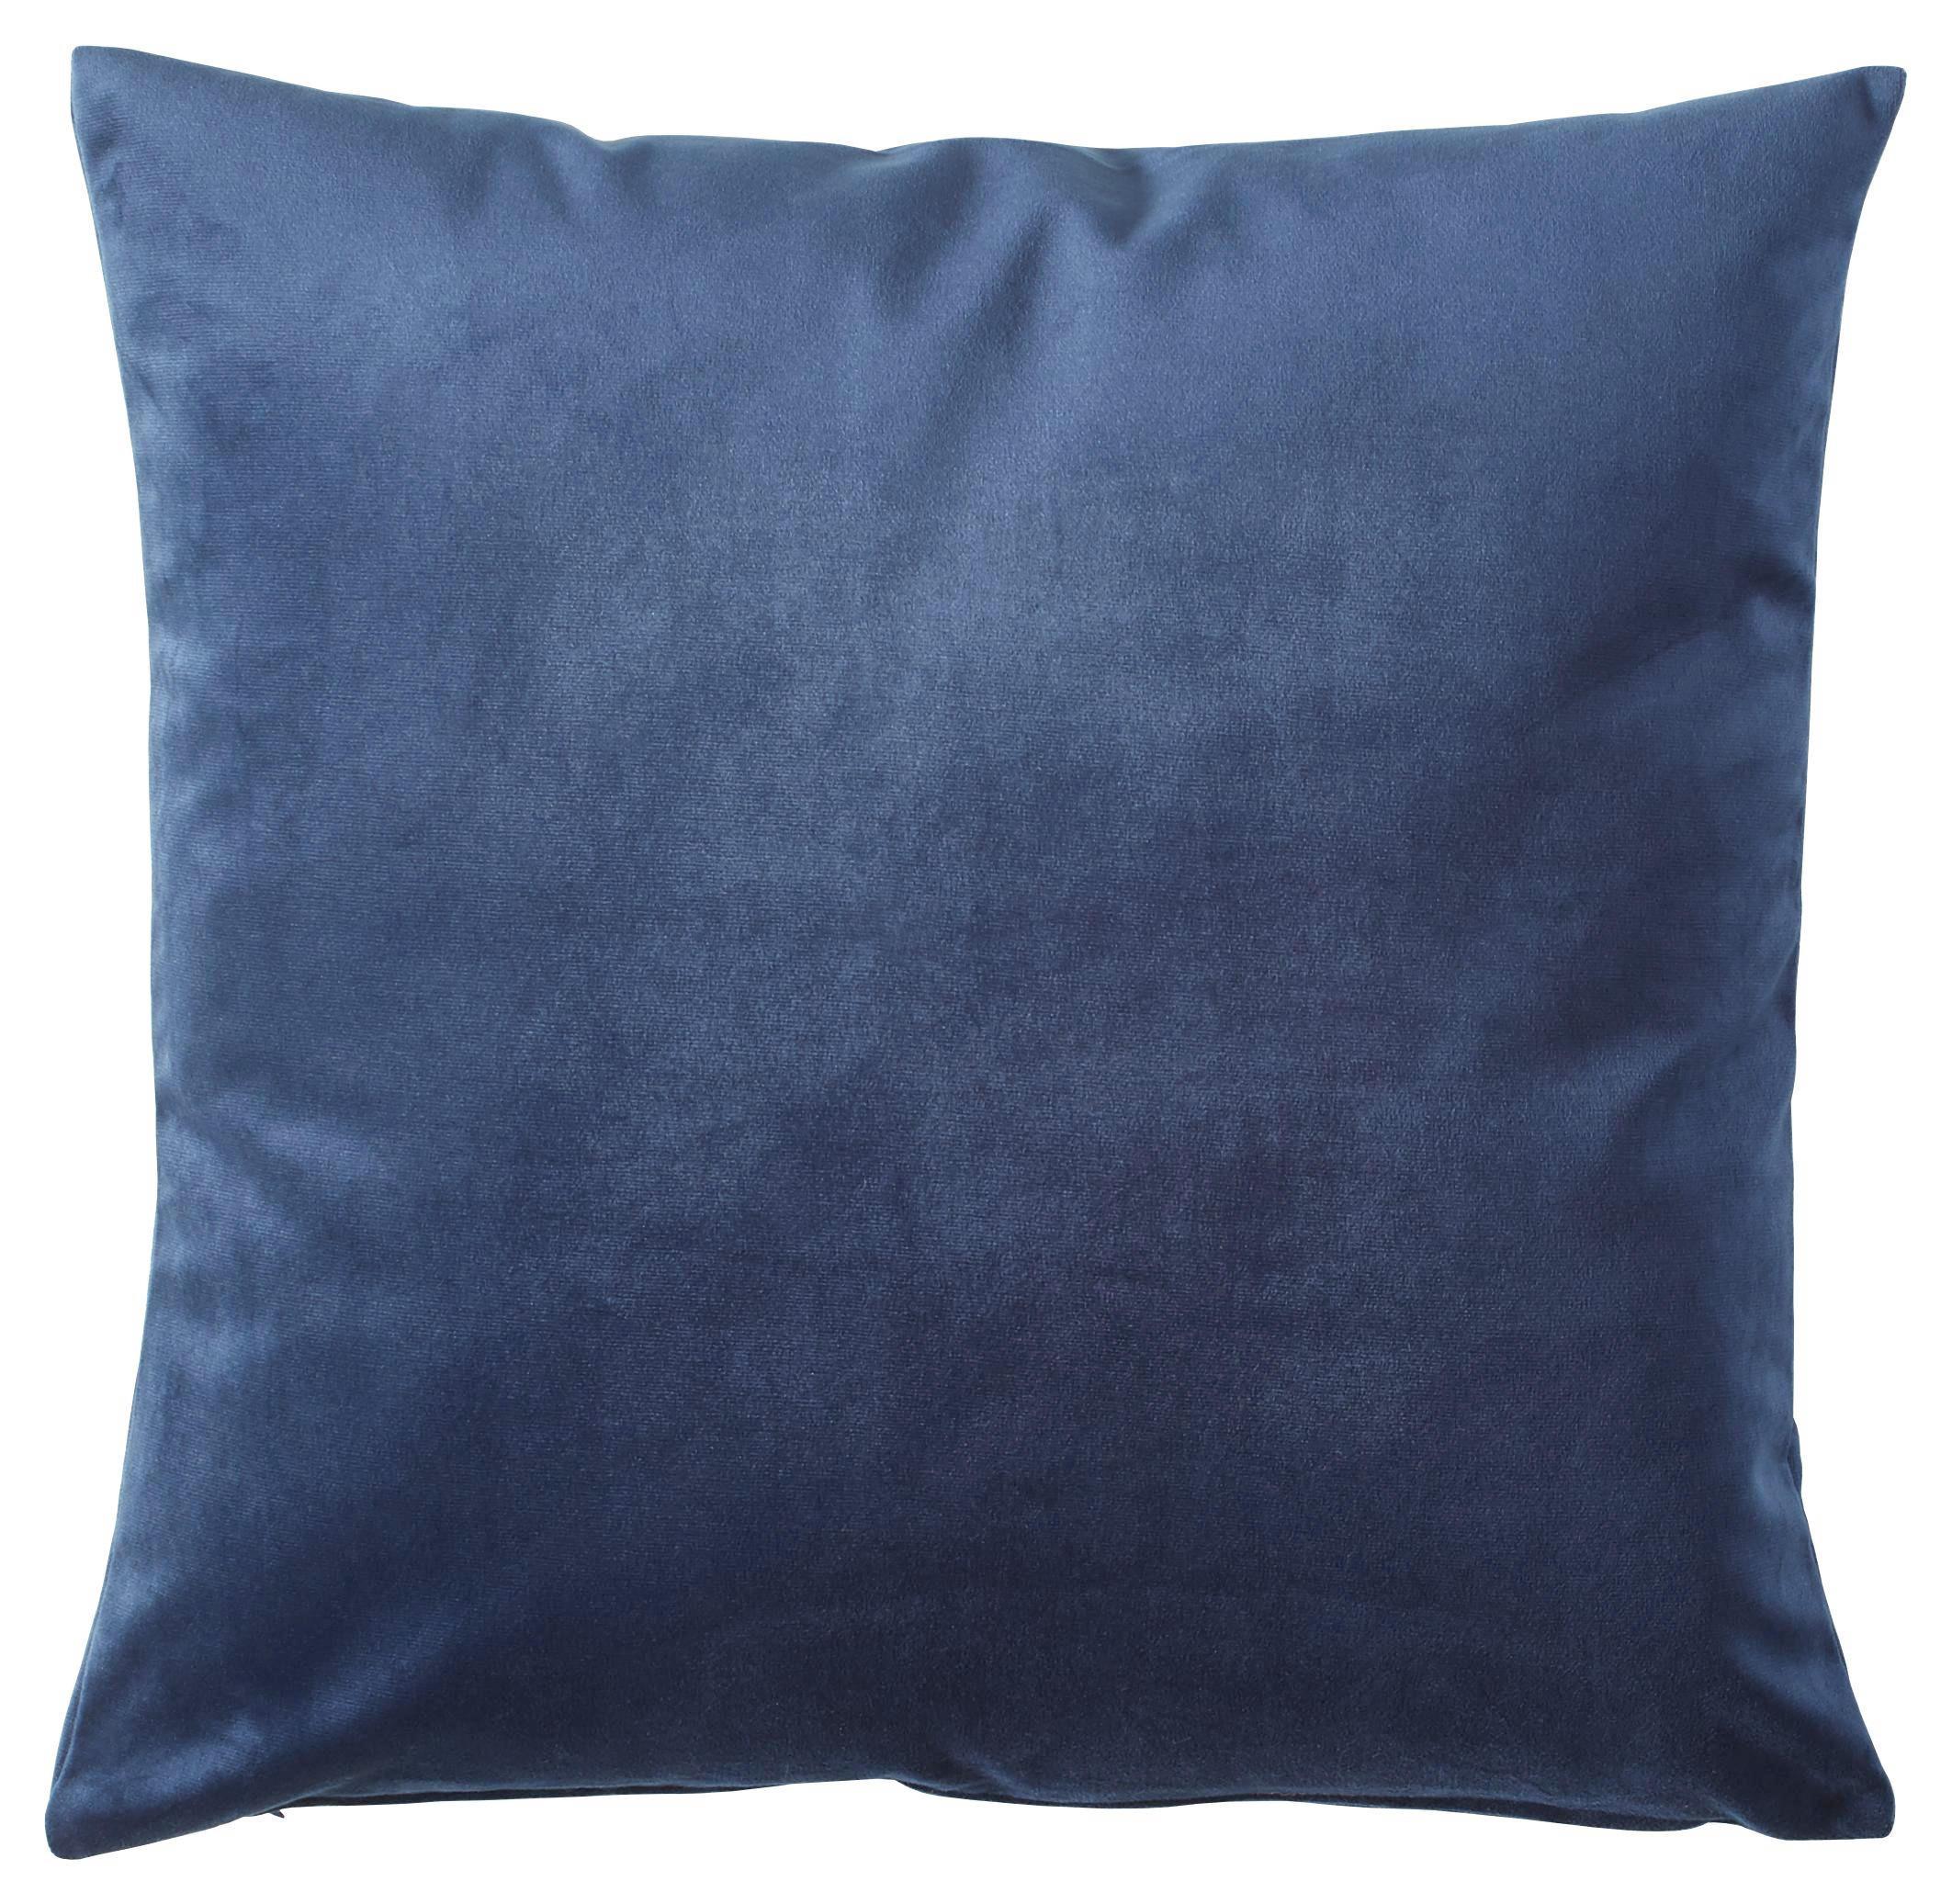 ZIERKISSEN 50/50 cm - Dunkelblau, Basics, Textil (50/50cm) - NOVEL